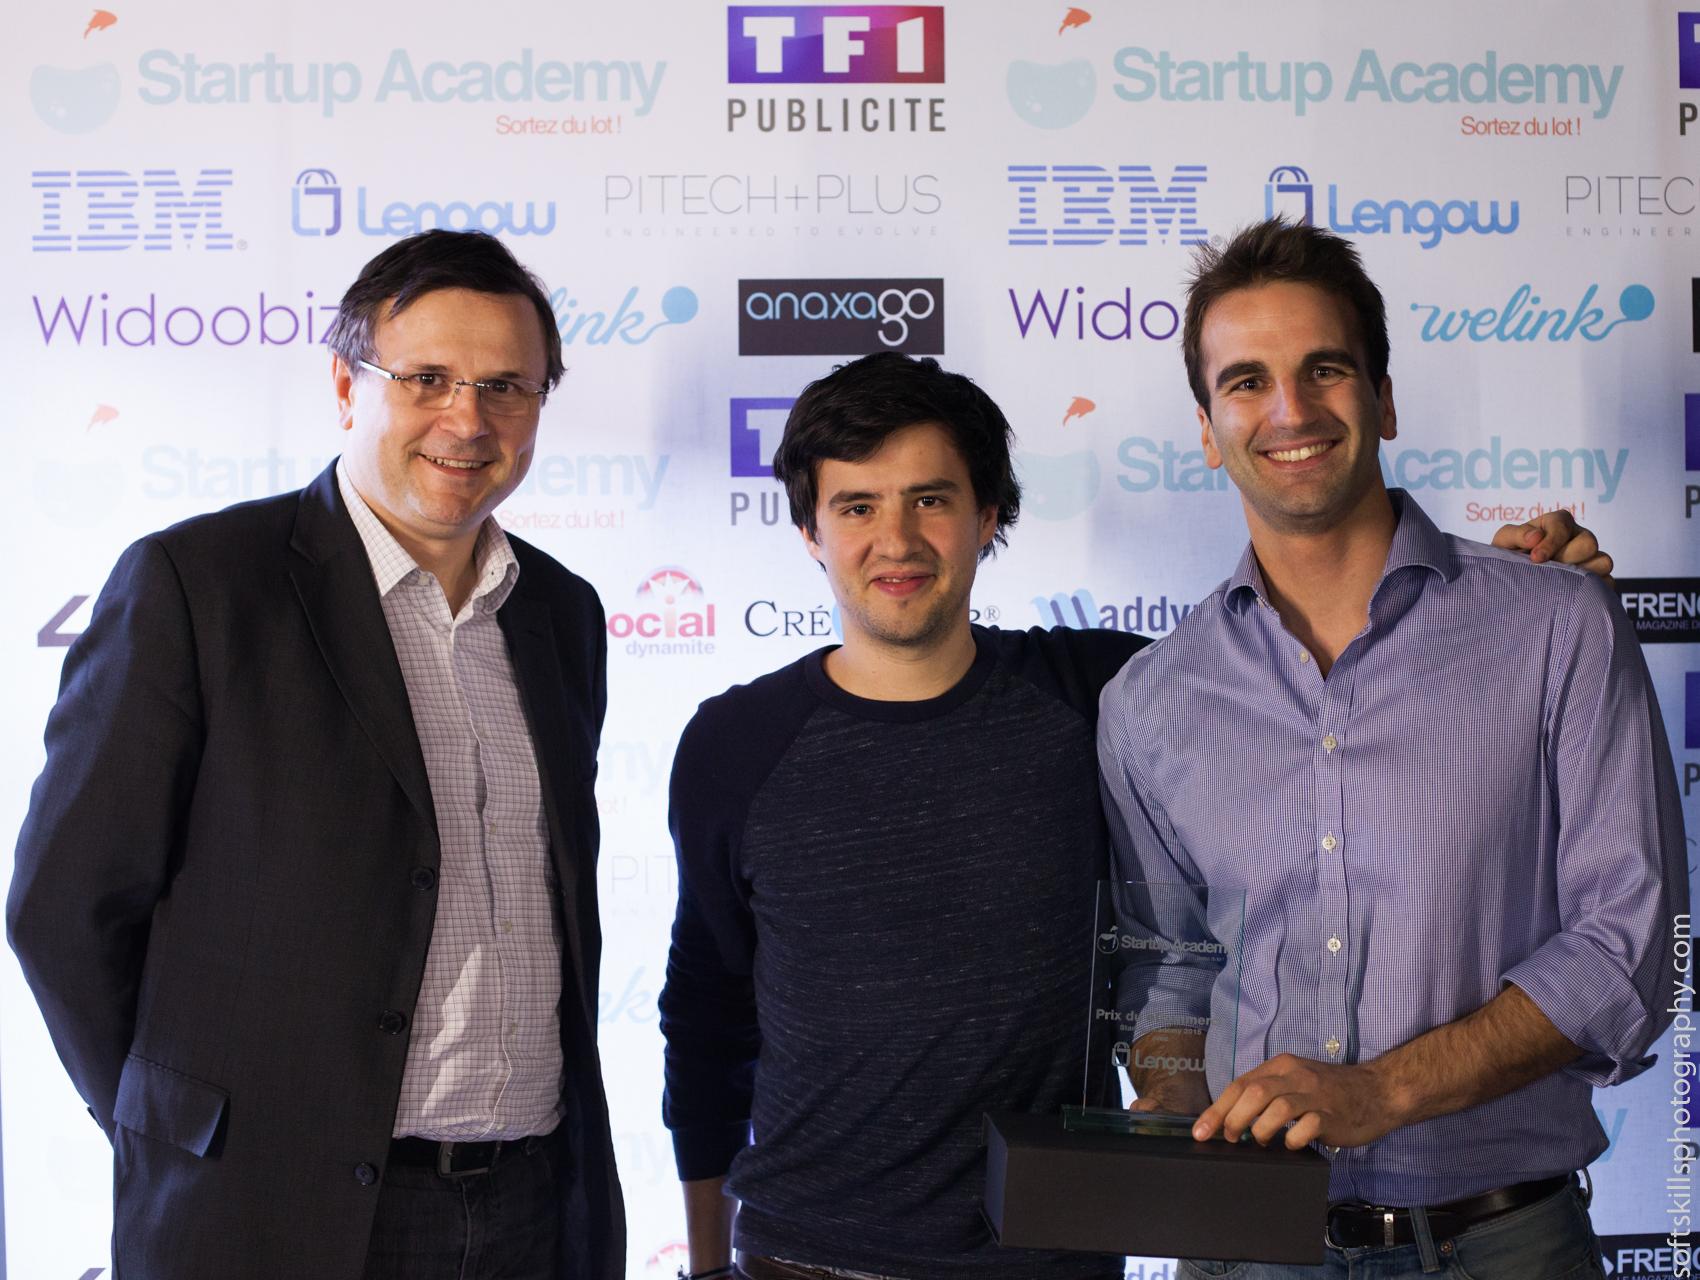 Prix ecommerce avec Lengow SA 2015 – Goku